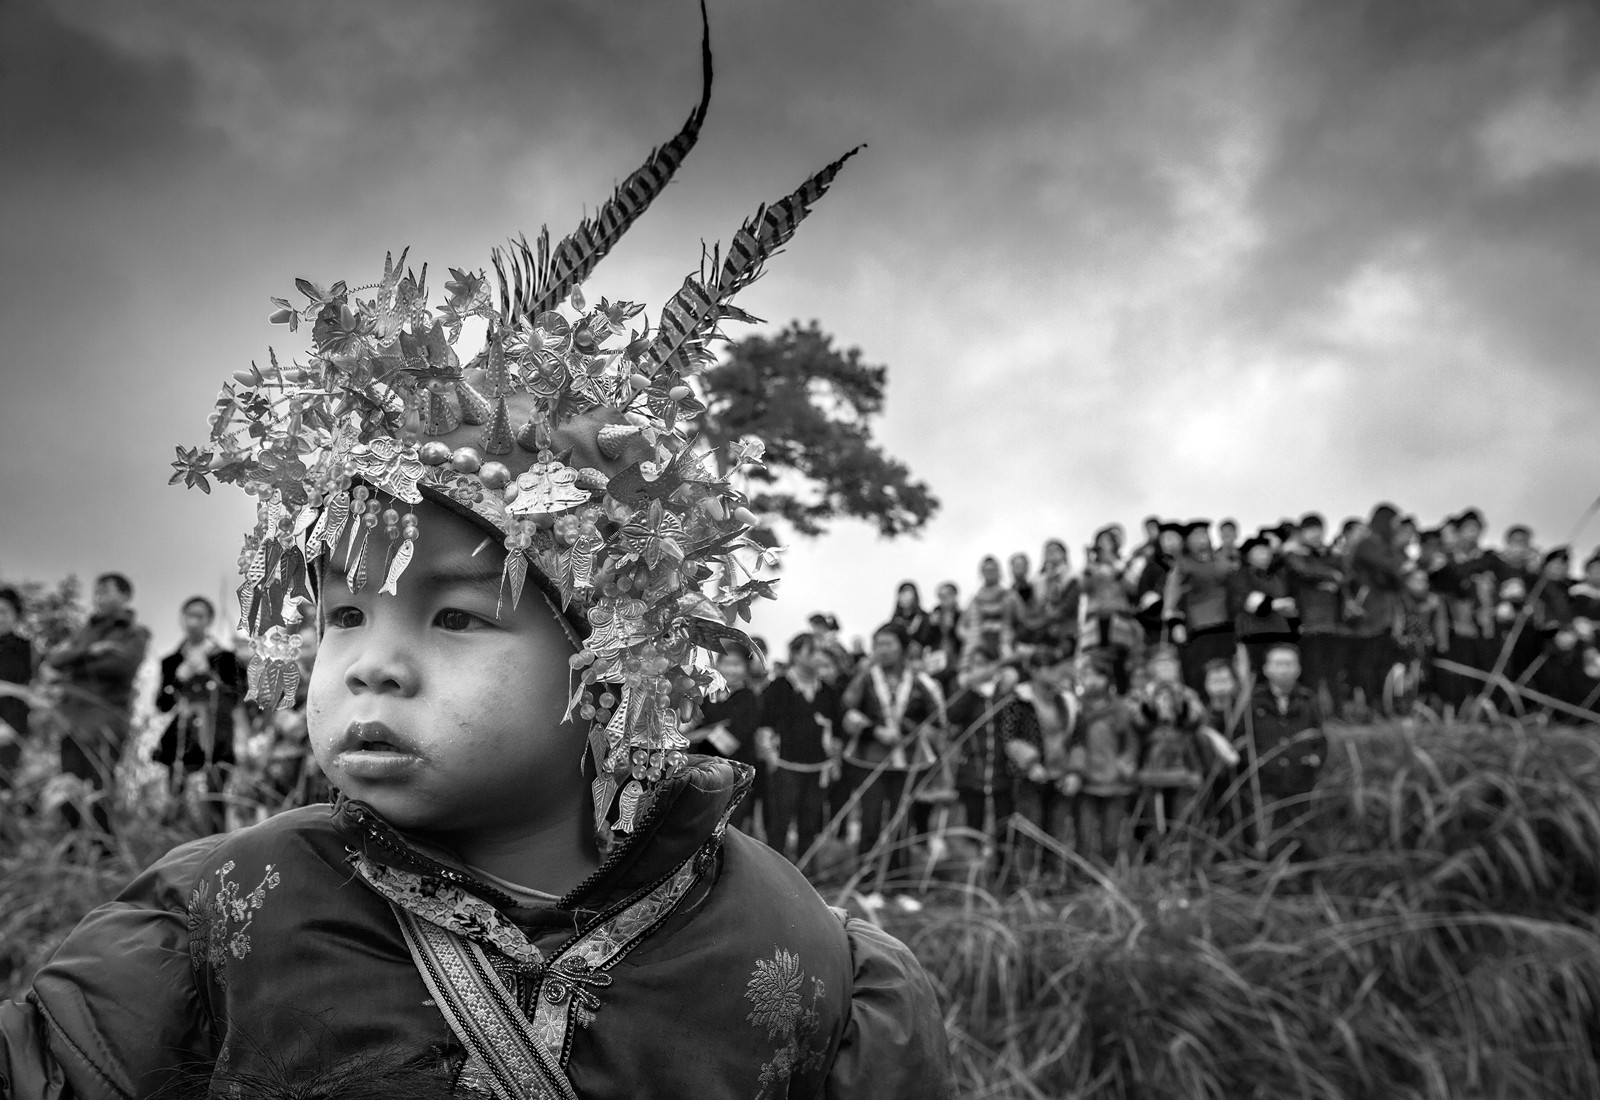 kuang-huimin-ancient-kam-rice-of-millennium-photography-of-china-(2).jpg